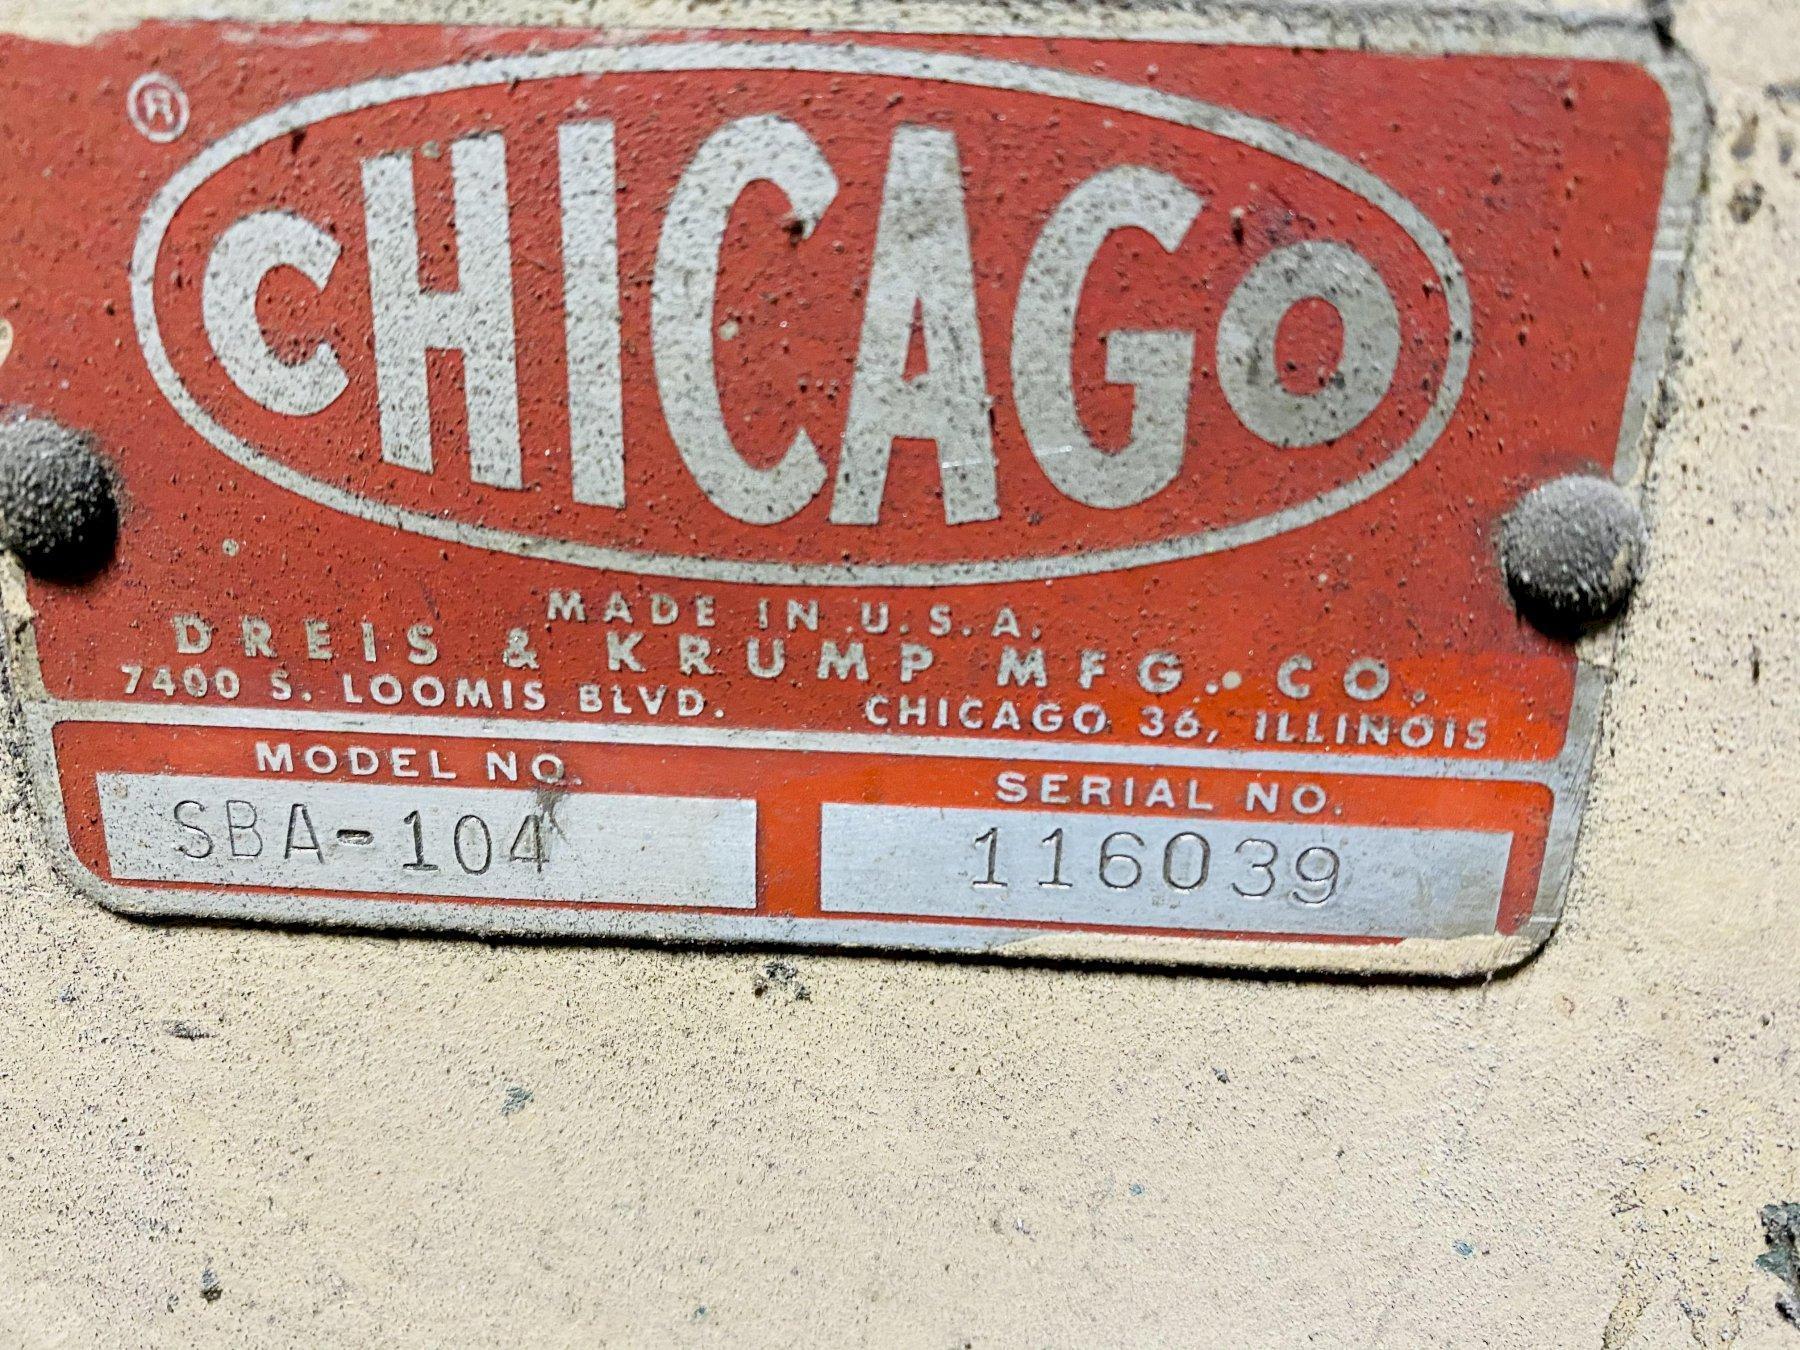 16 GAUGE X 10' CHICAGO DRIES & KRUMP MODEL SBA-104 SPEEDIBENDER SHEET BENDER BRAKE. STOCK # 1263620